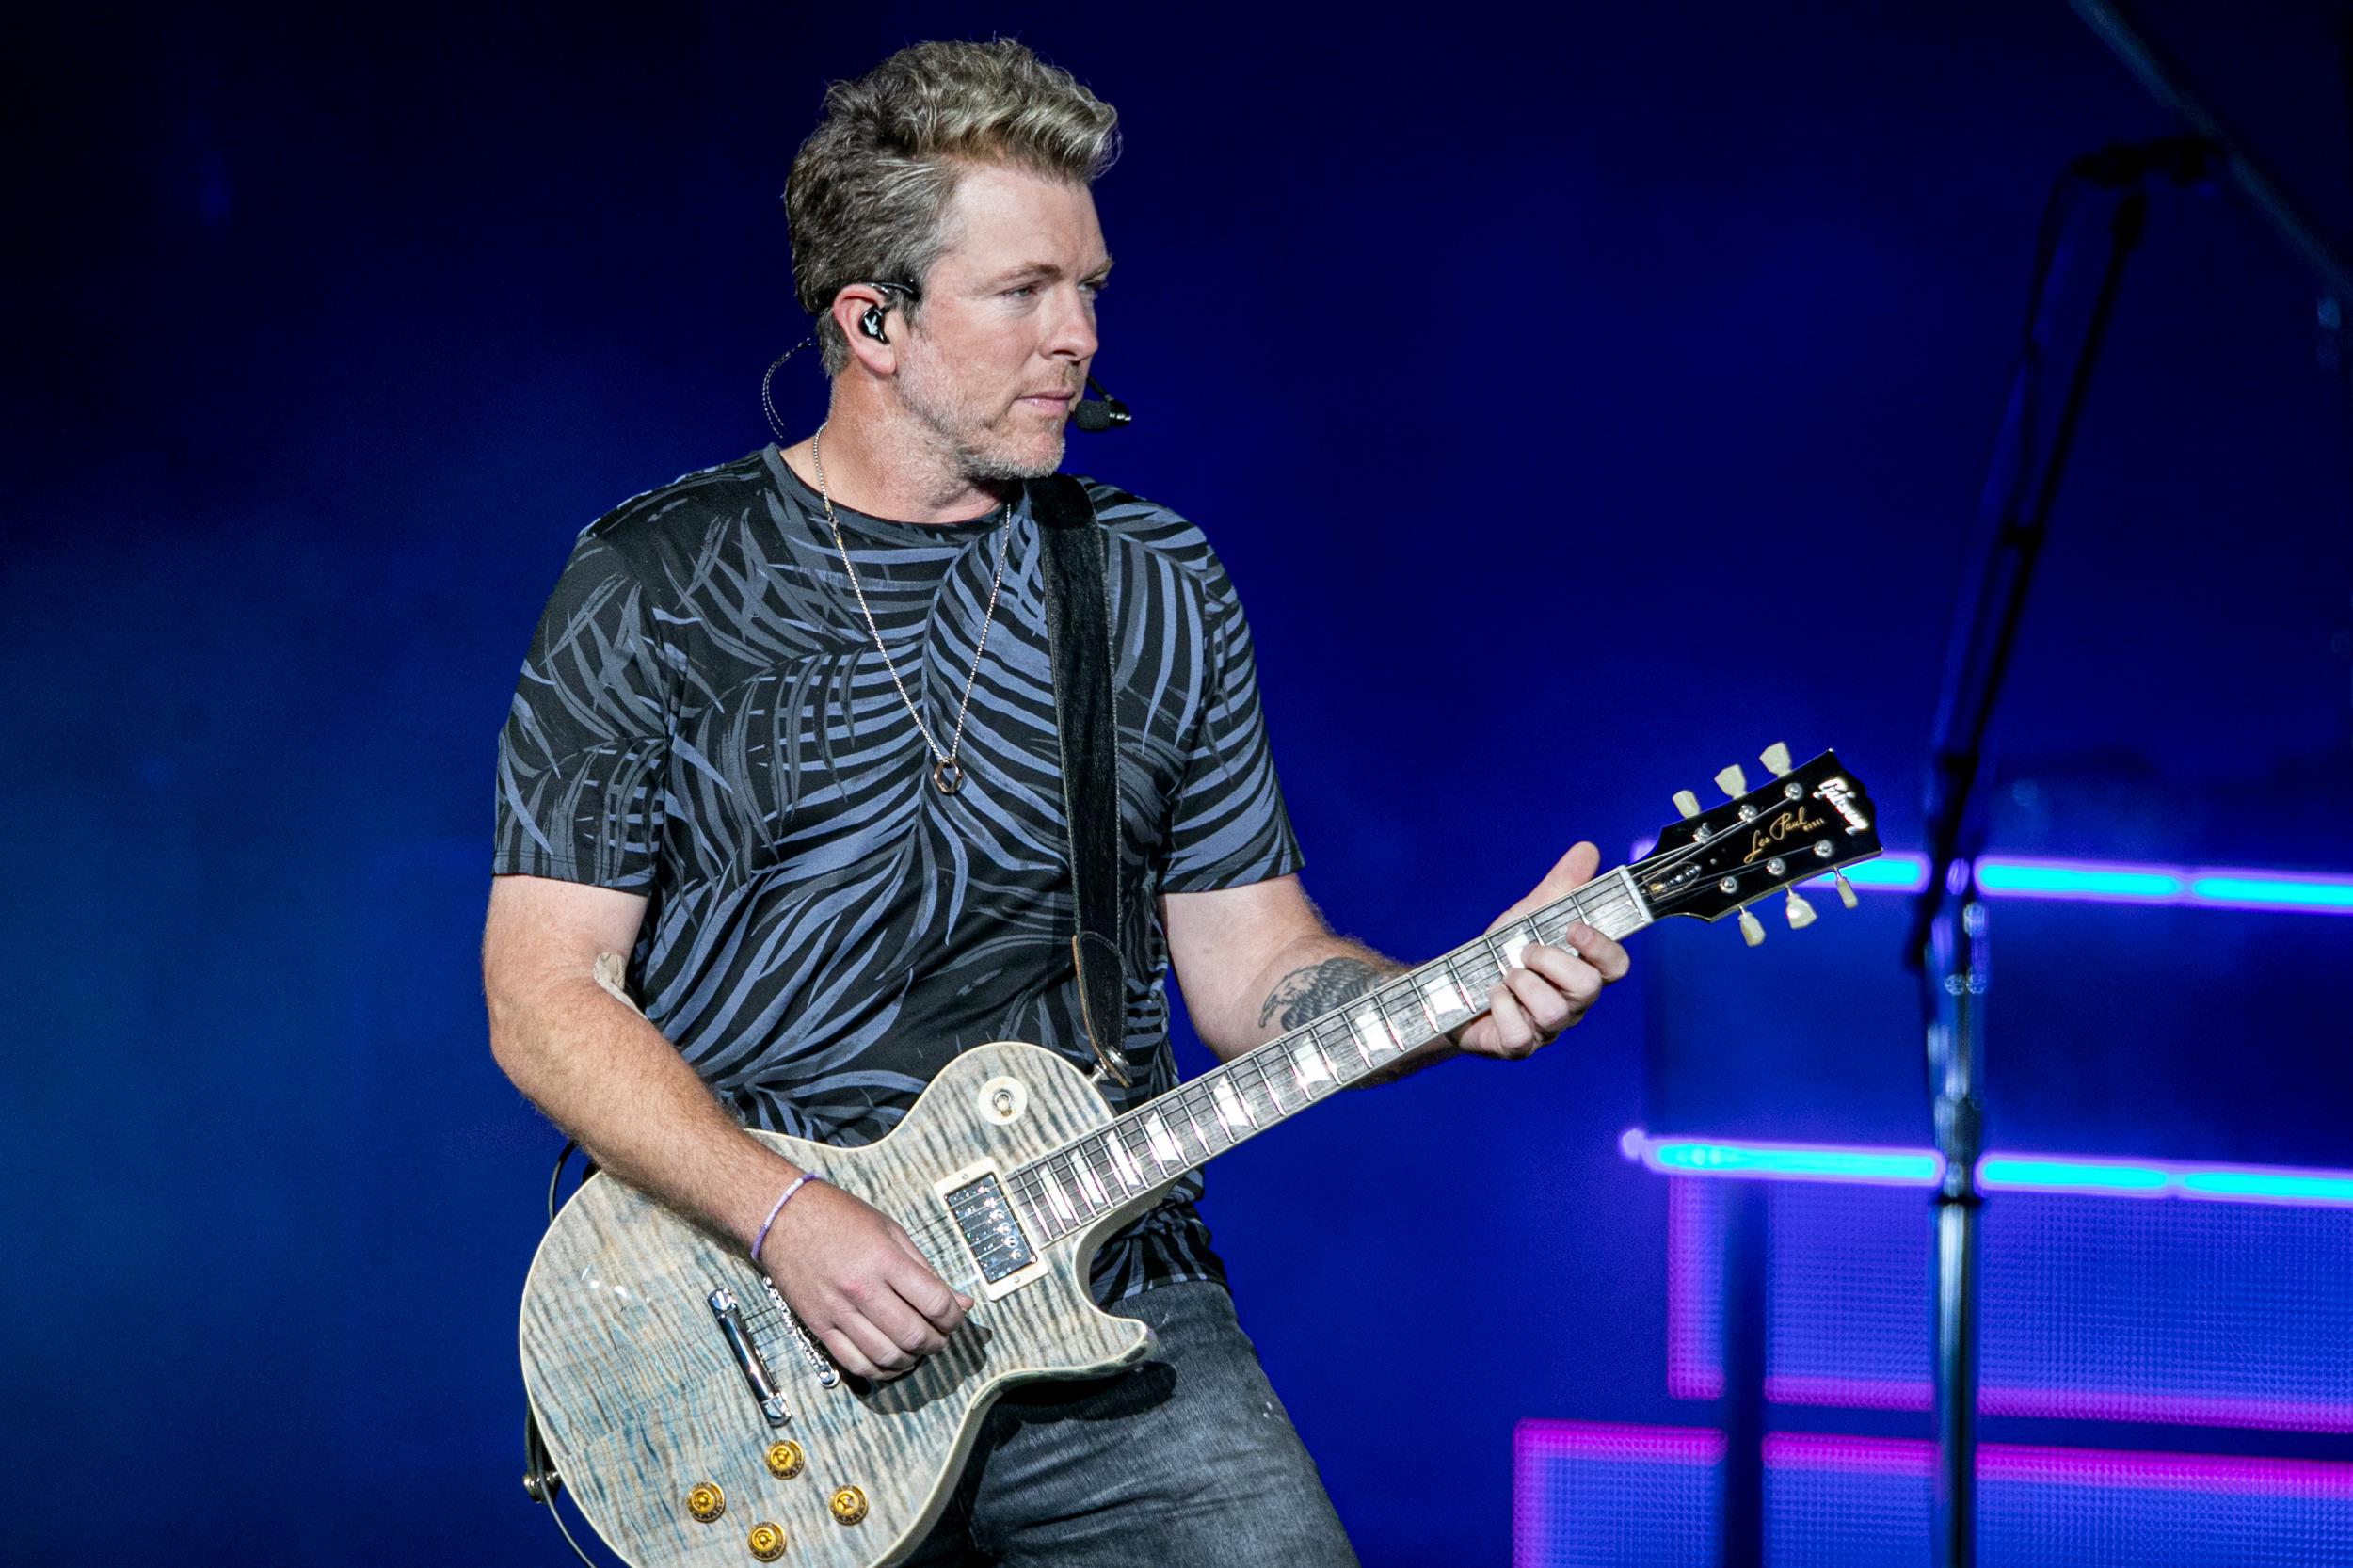 Rascal Flatts guitarist Joe Don Rooney arrested on DUI charge after crash